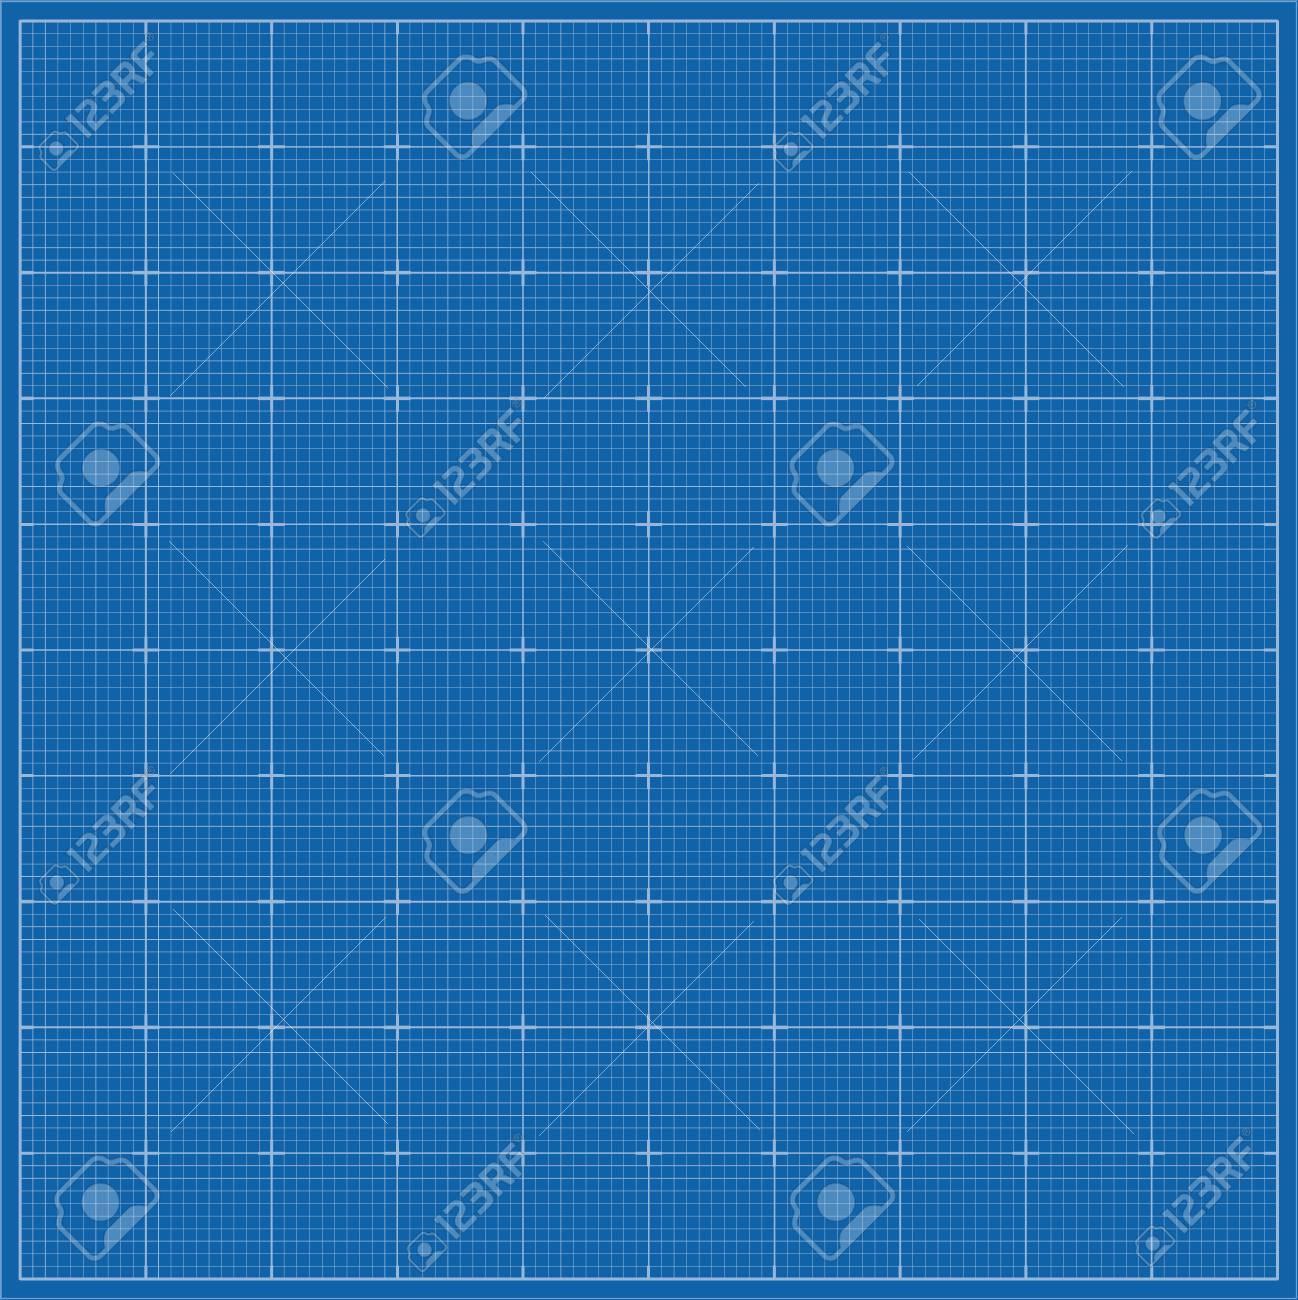 Blueprint background vector illustration royalty free cliparts blueprint background vector illustration stock vector 25815806 malvernweather Gallery